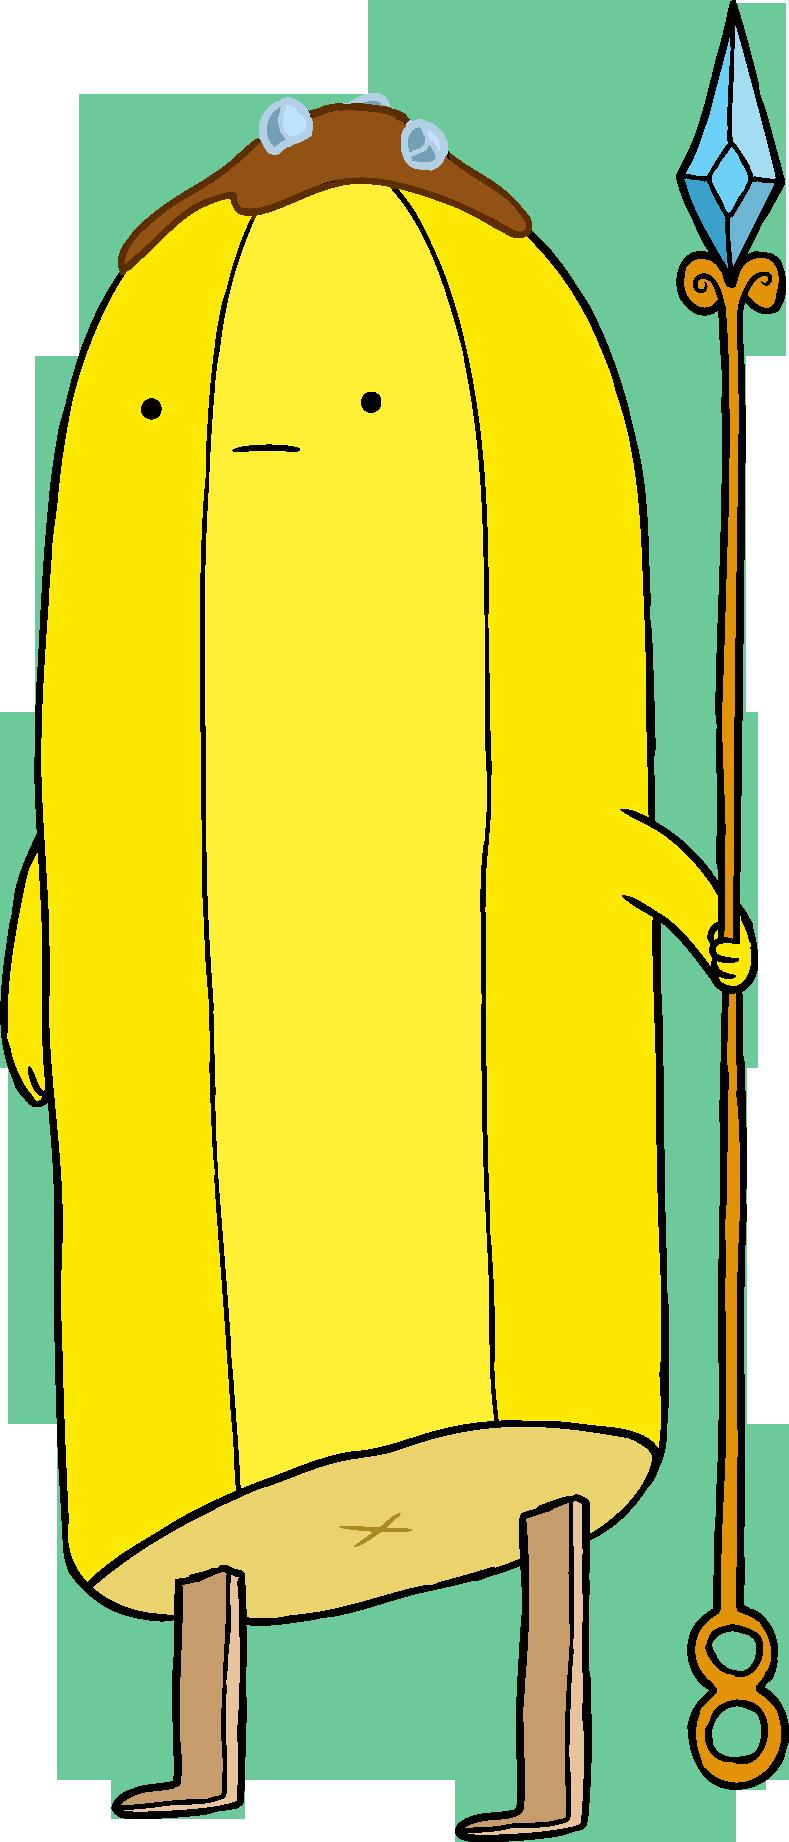 Banana Guardias | Hora de aventura Wiki | FANDOM powered by Wikia